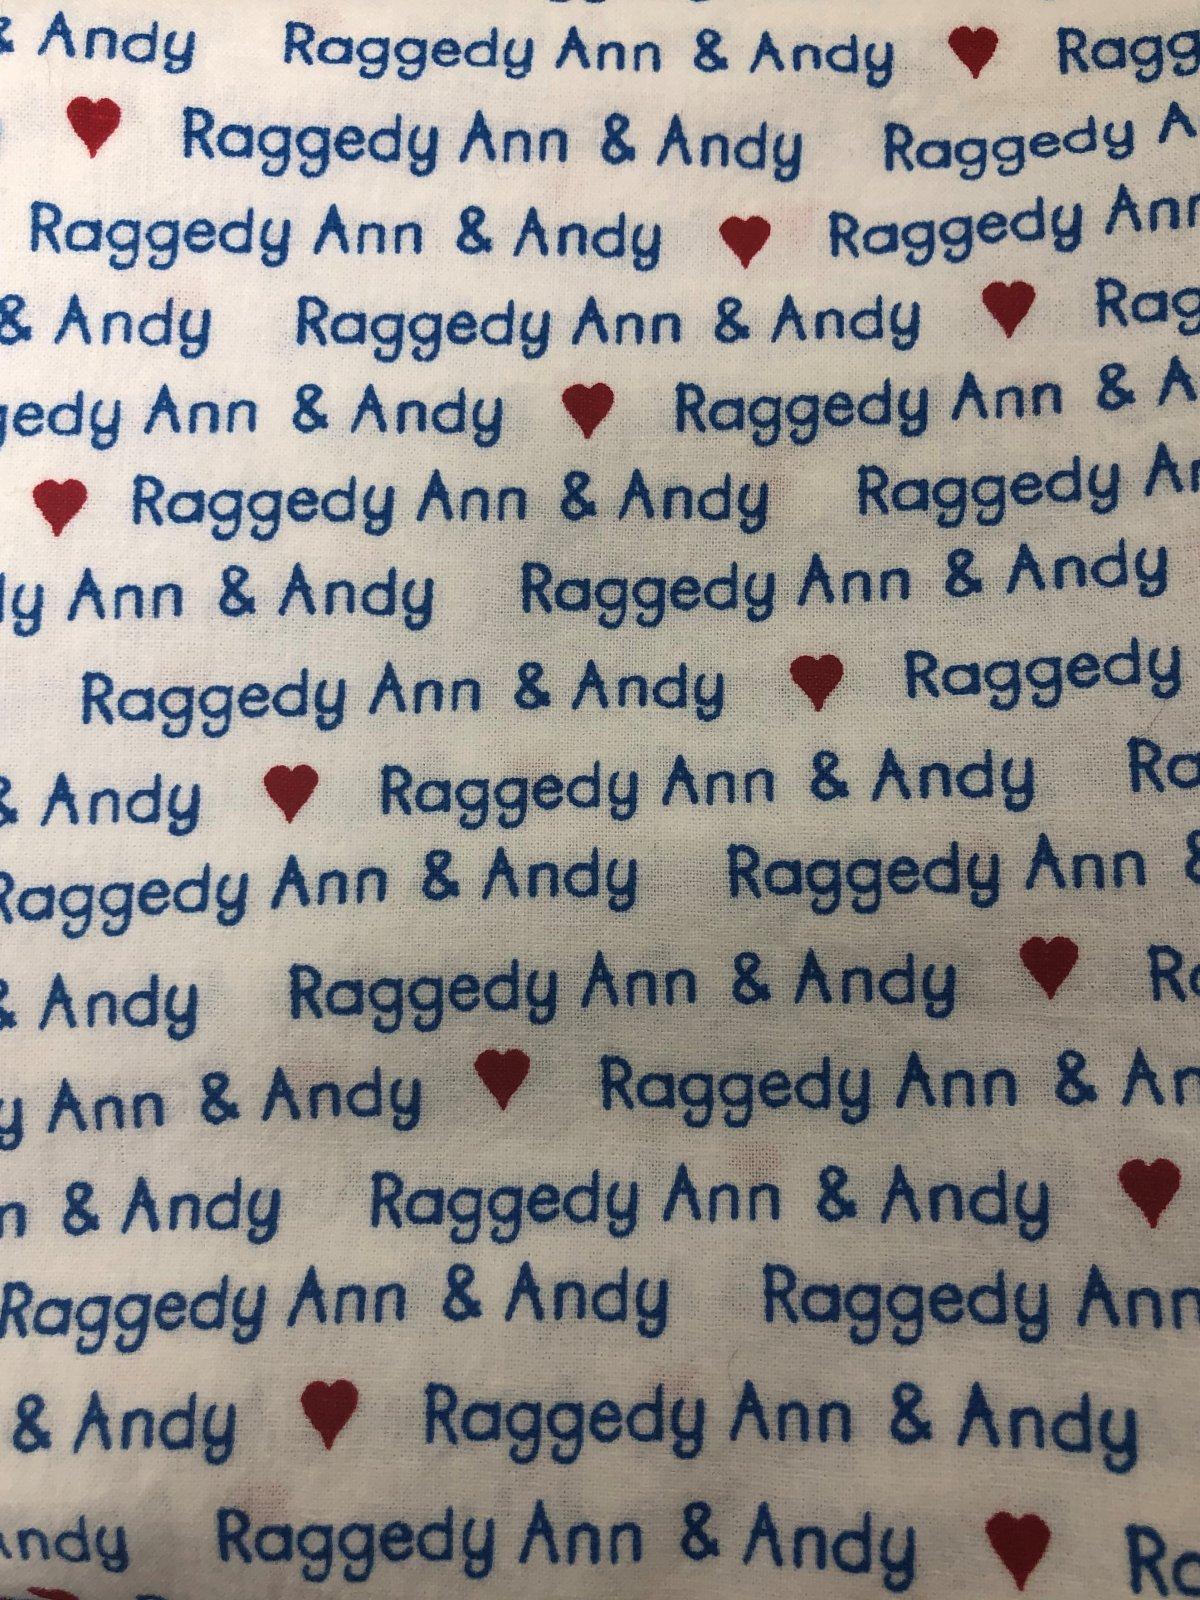 16 Remnant Daisy Kingdom Vintage Raggedy Ann Words on White